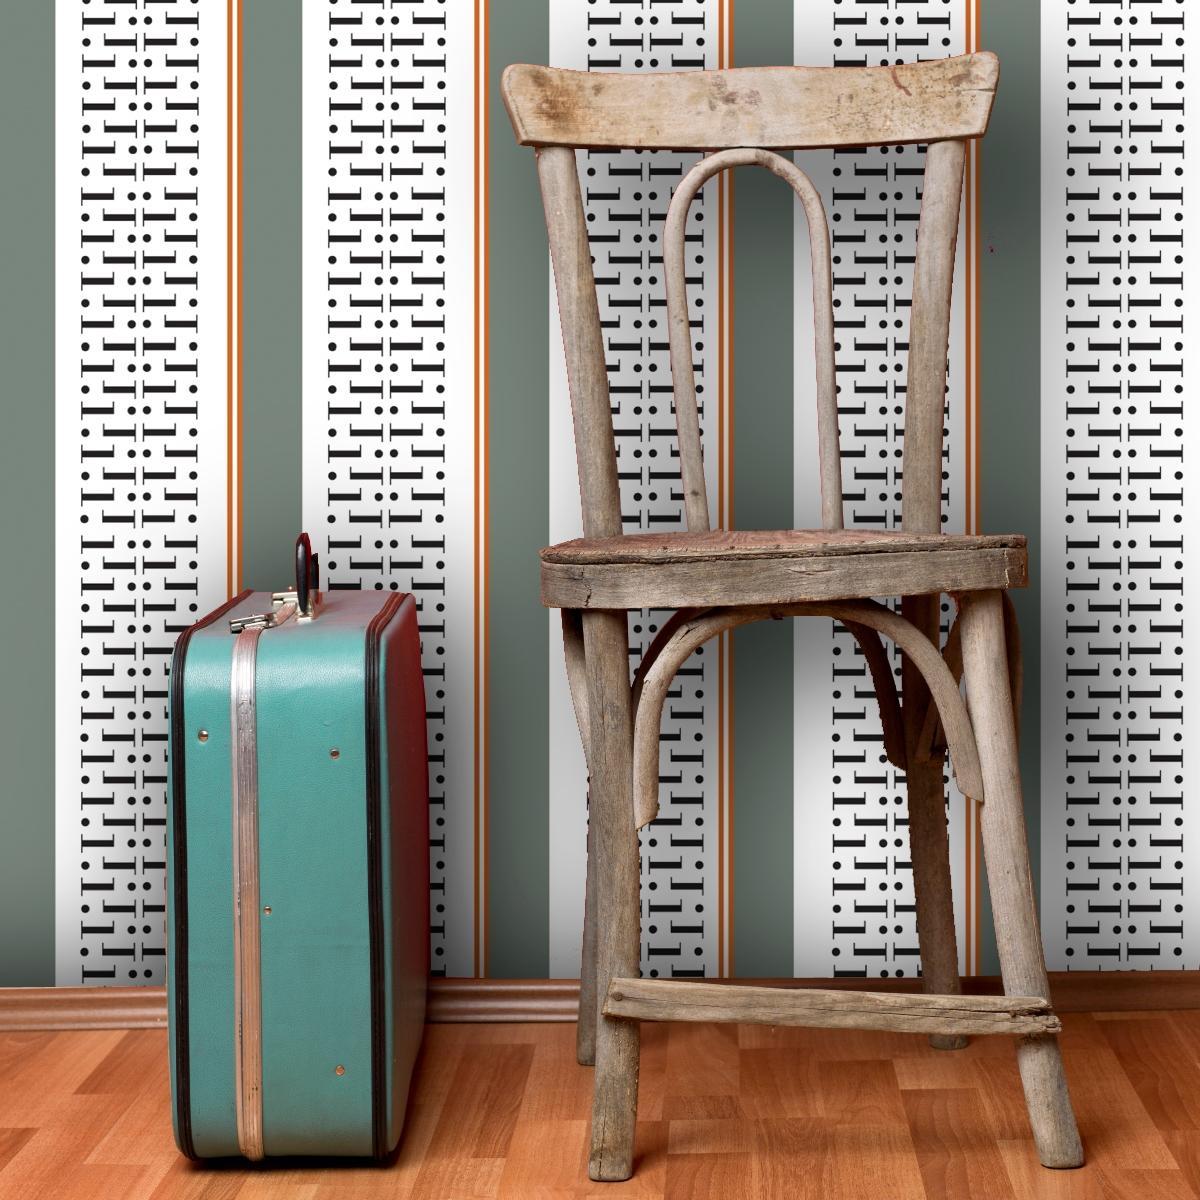 Suitcase-and-Wood-Chair-IGGY-pumice.jpg